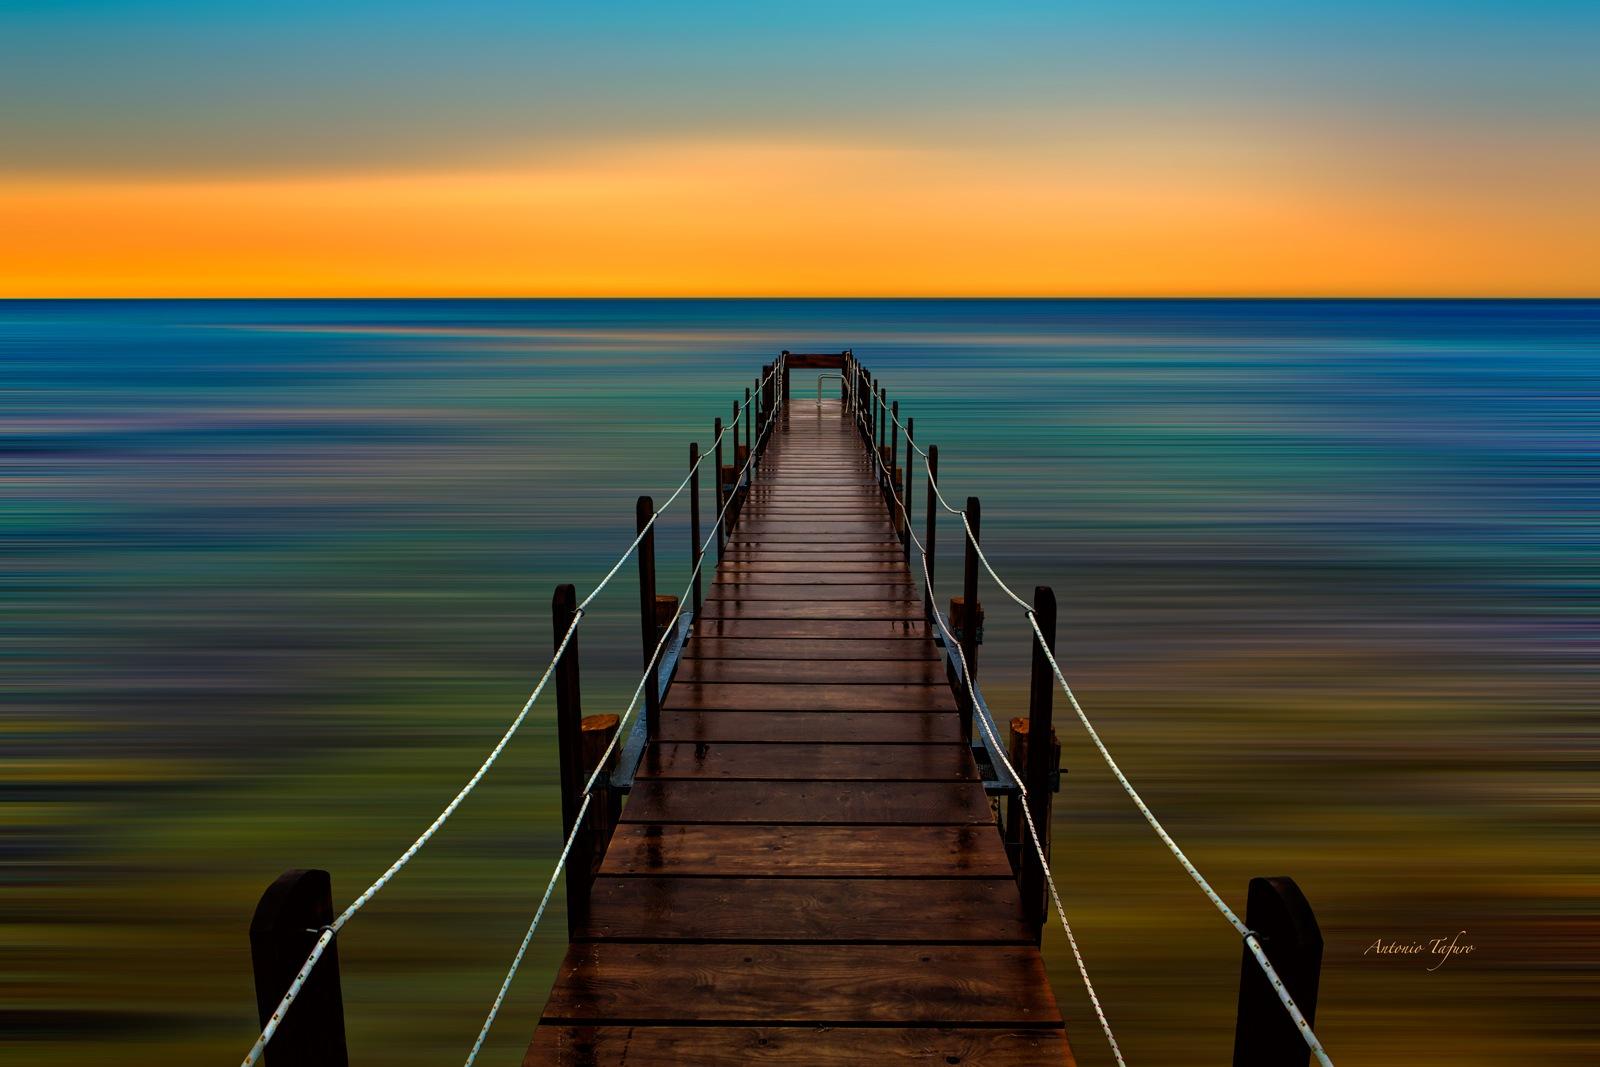 footbridge on infinity by Antonio Tafuro